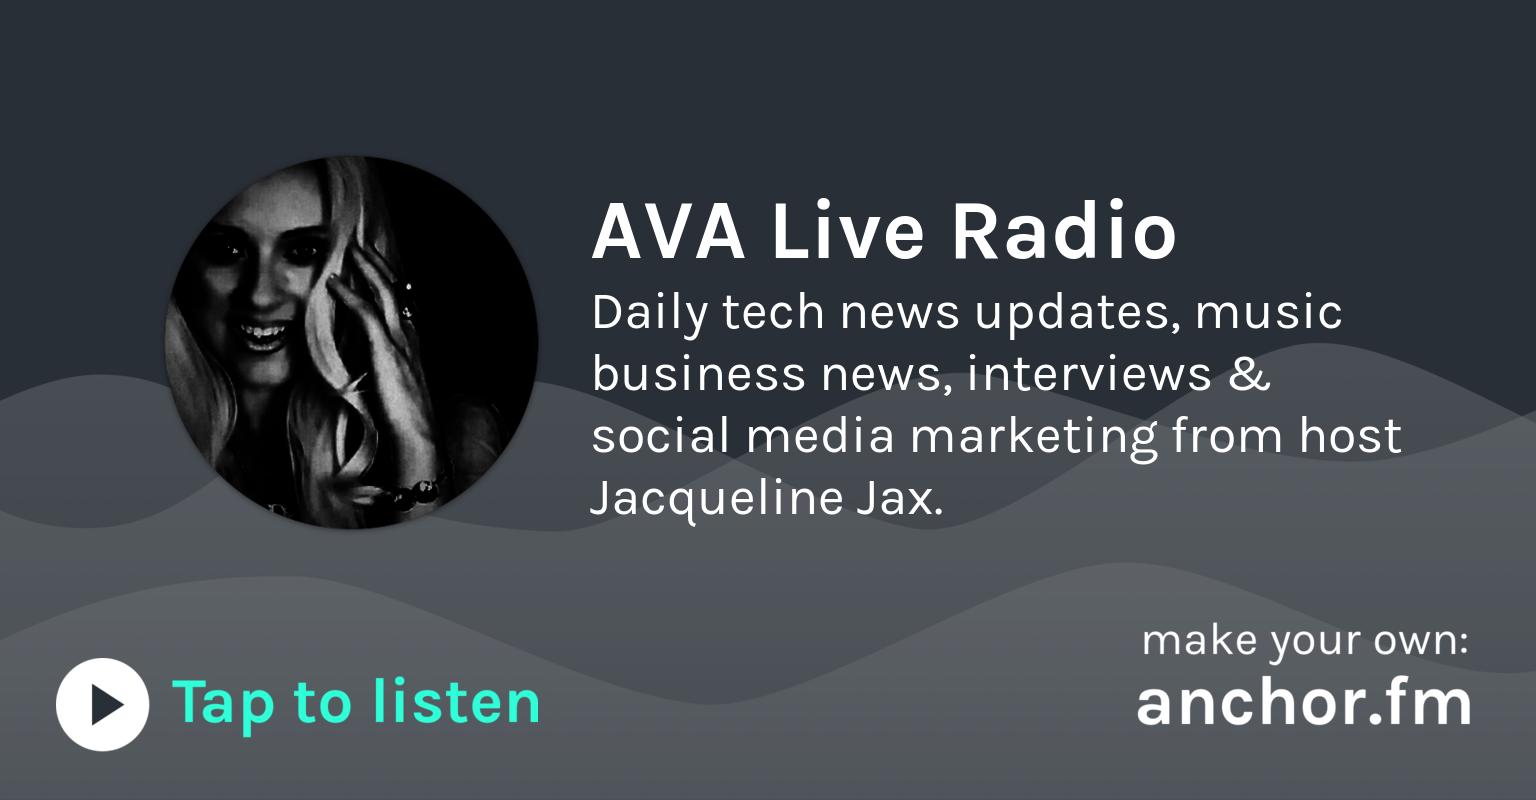 Ava Live Radio Anchor Radio Reinvented Music Business Radio Entertainment News